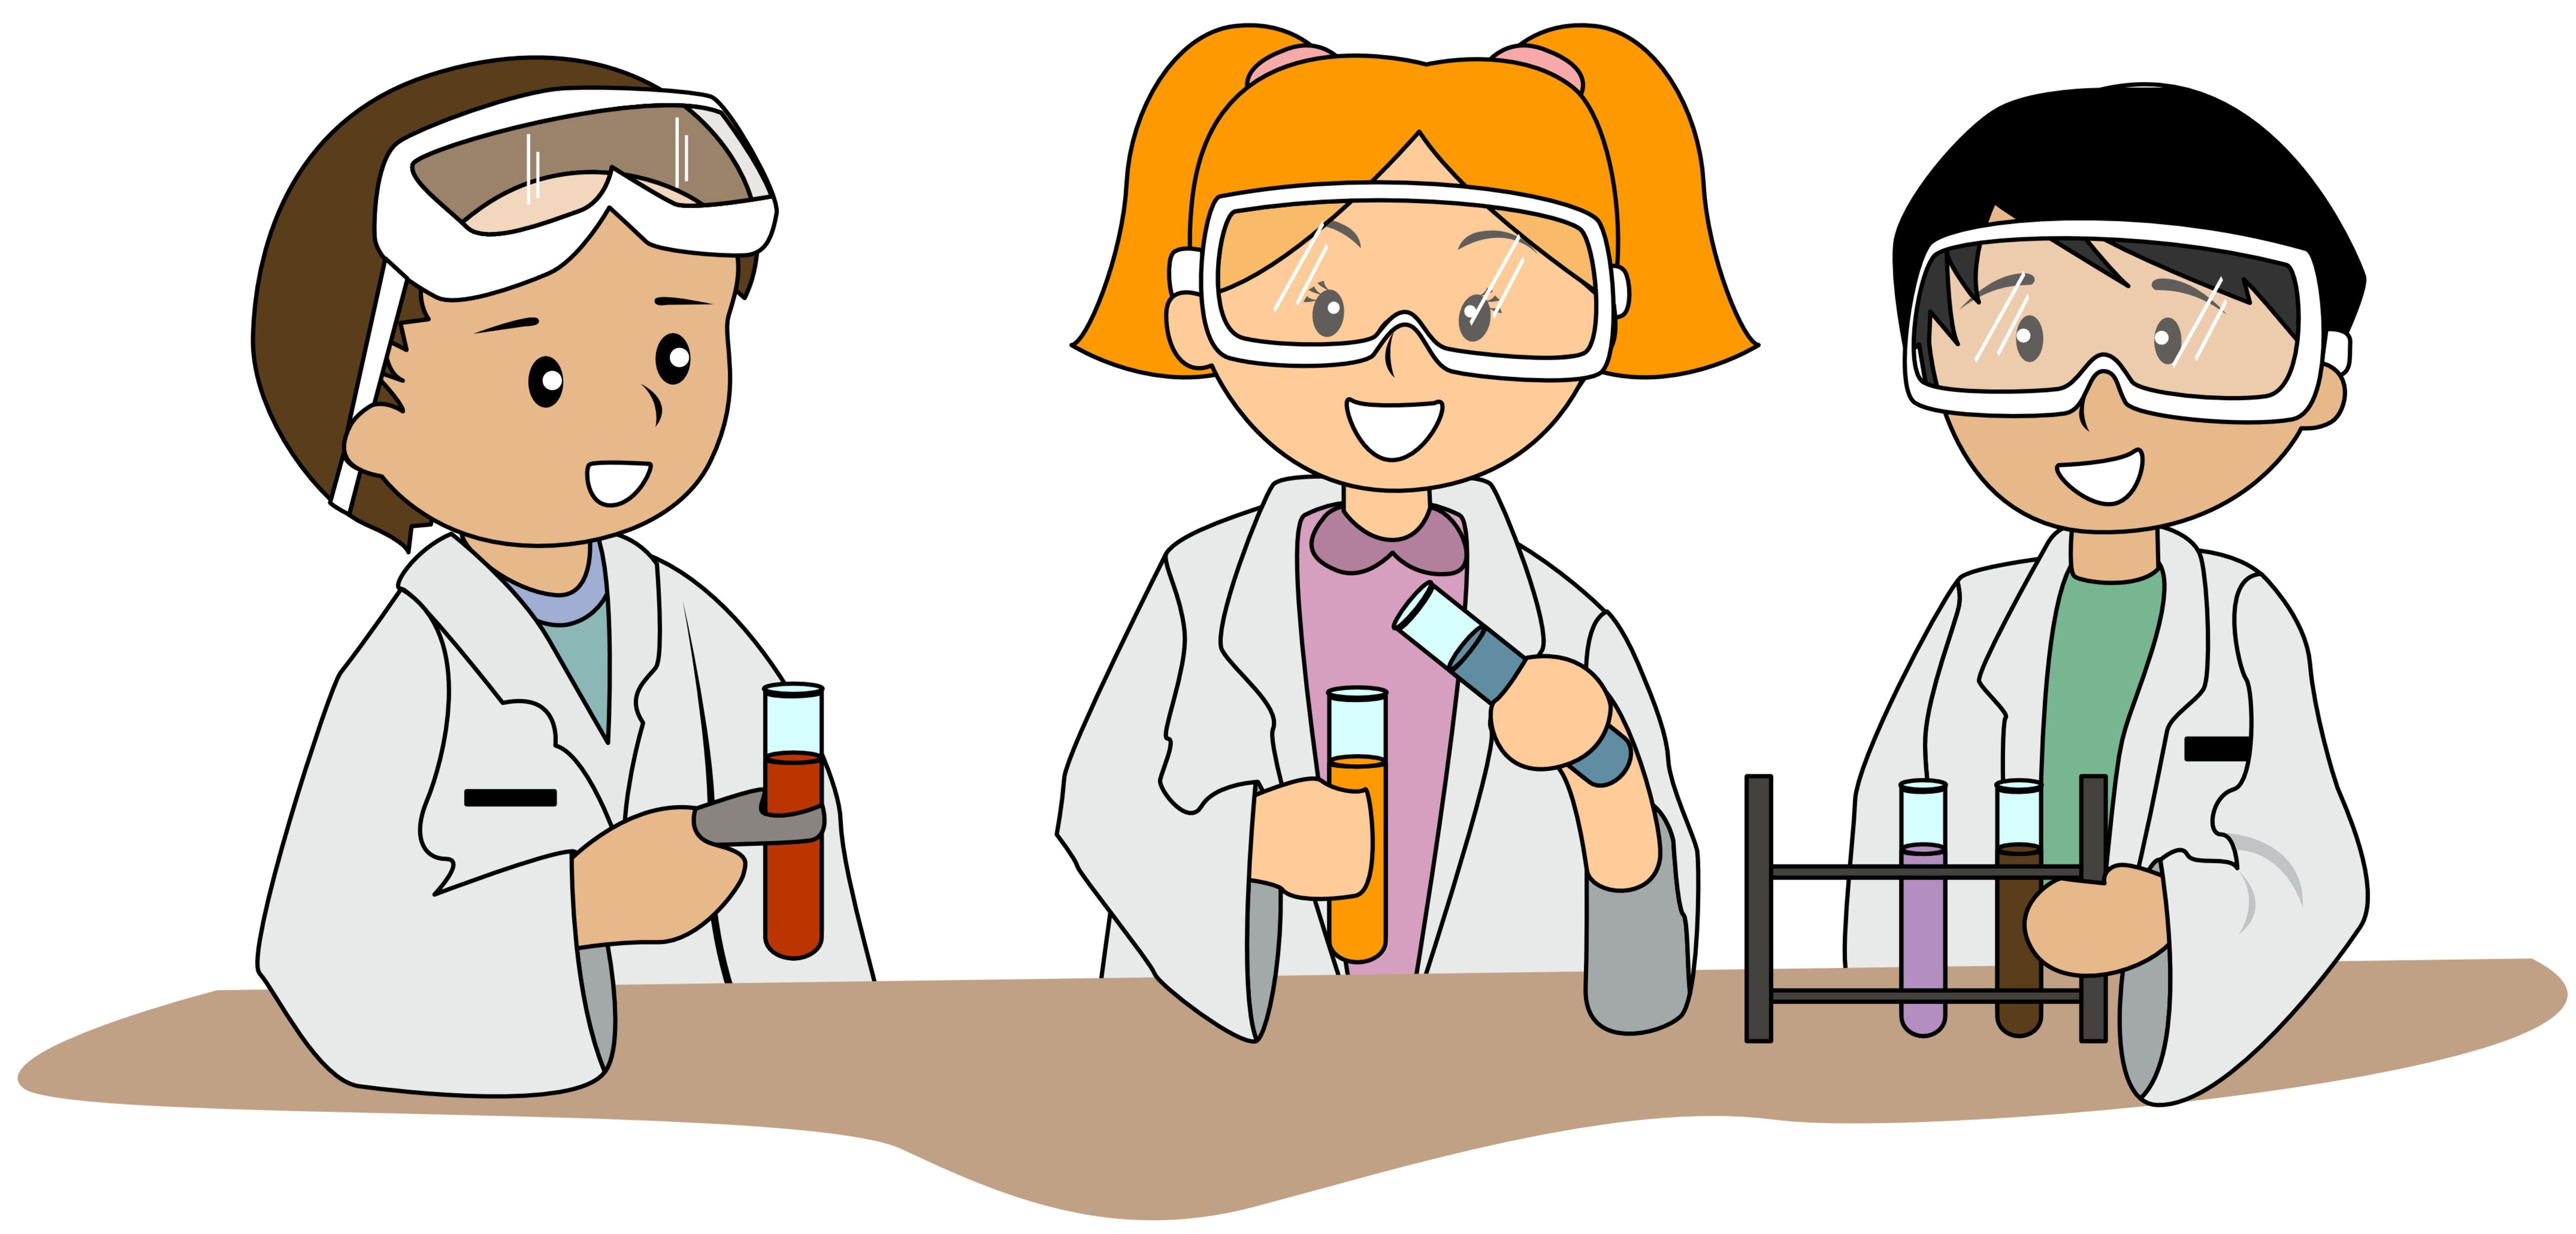 Laboratory clipart science class Scientific Science The Clipart In